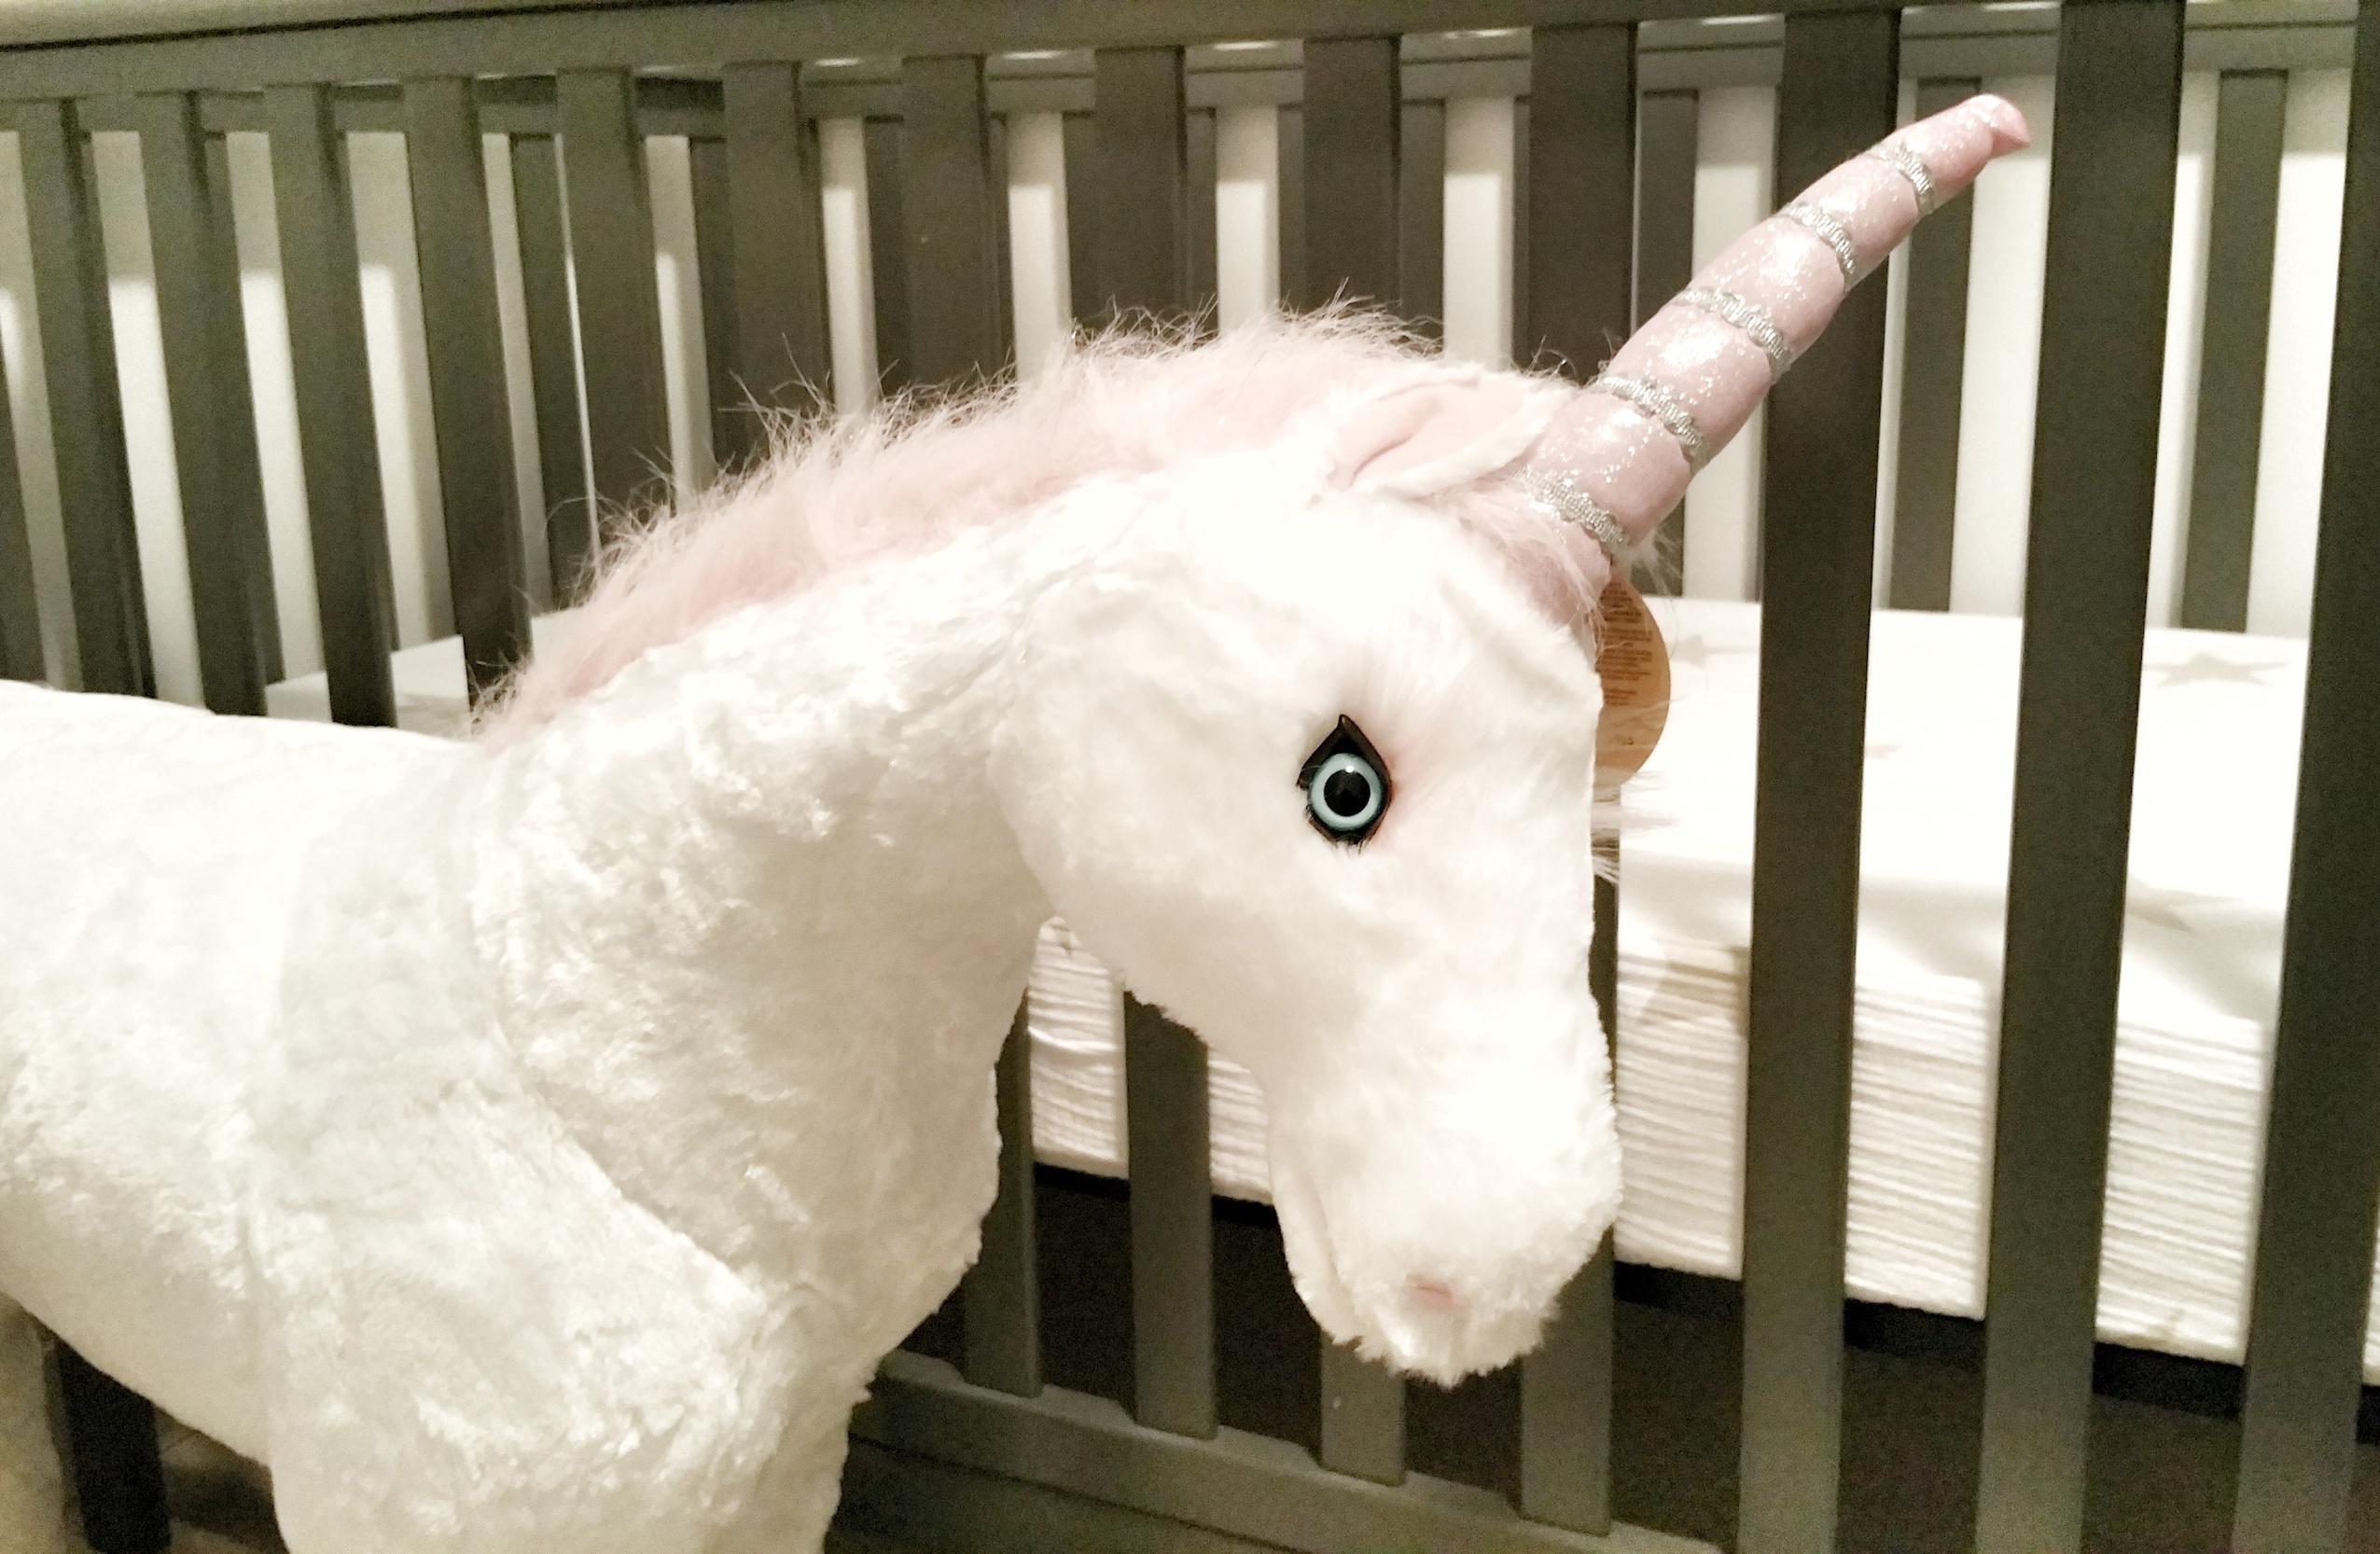 md_unicorn_head_bby